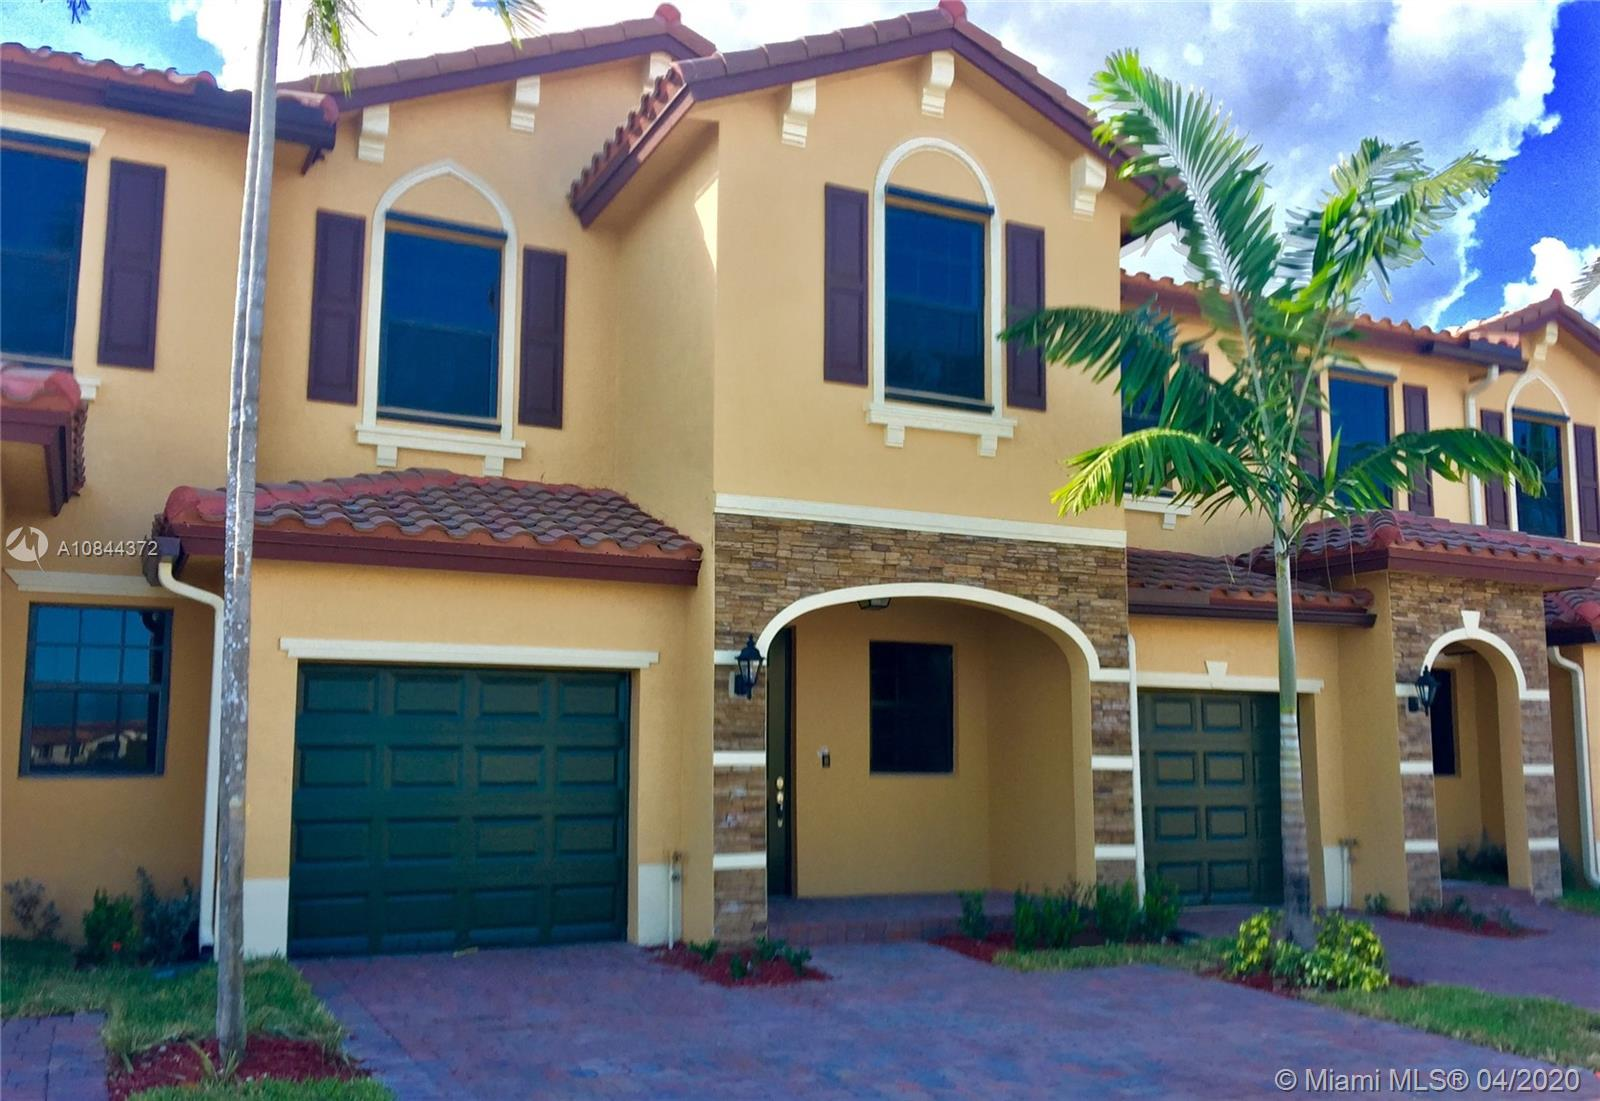 126 SE 33rd Ter, Homestead, FL 33033 - Homestead, FL real estate listing